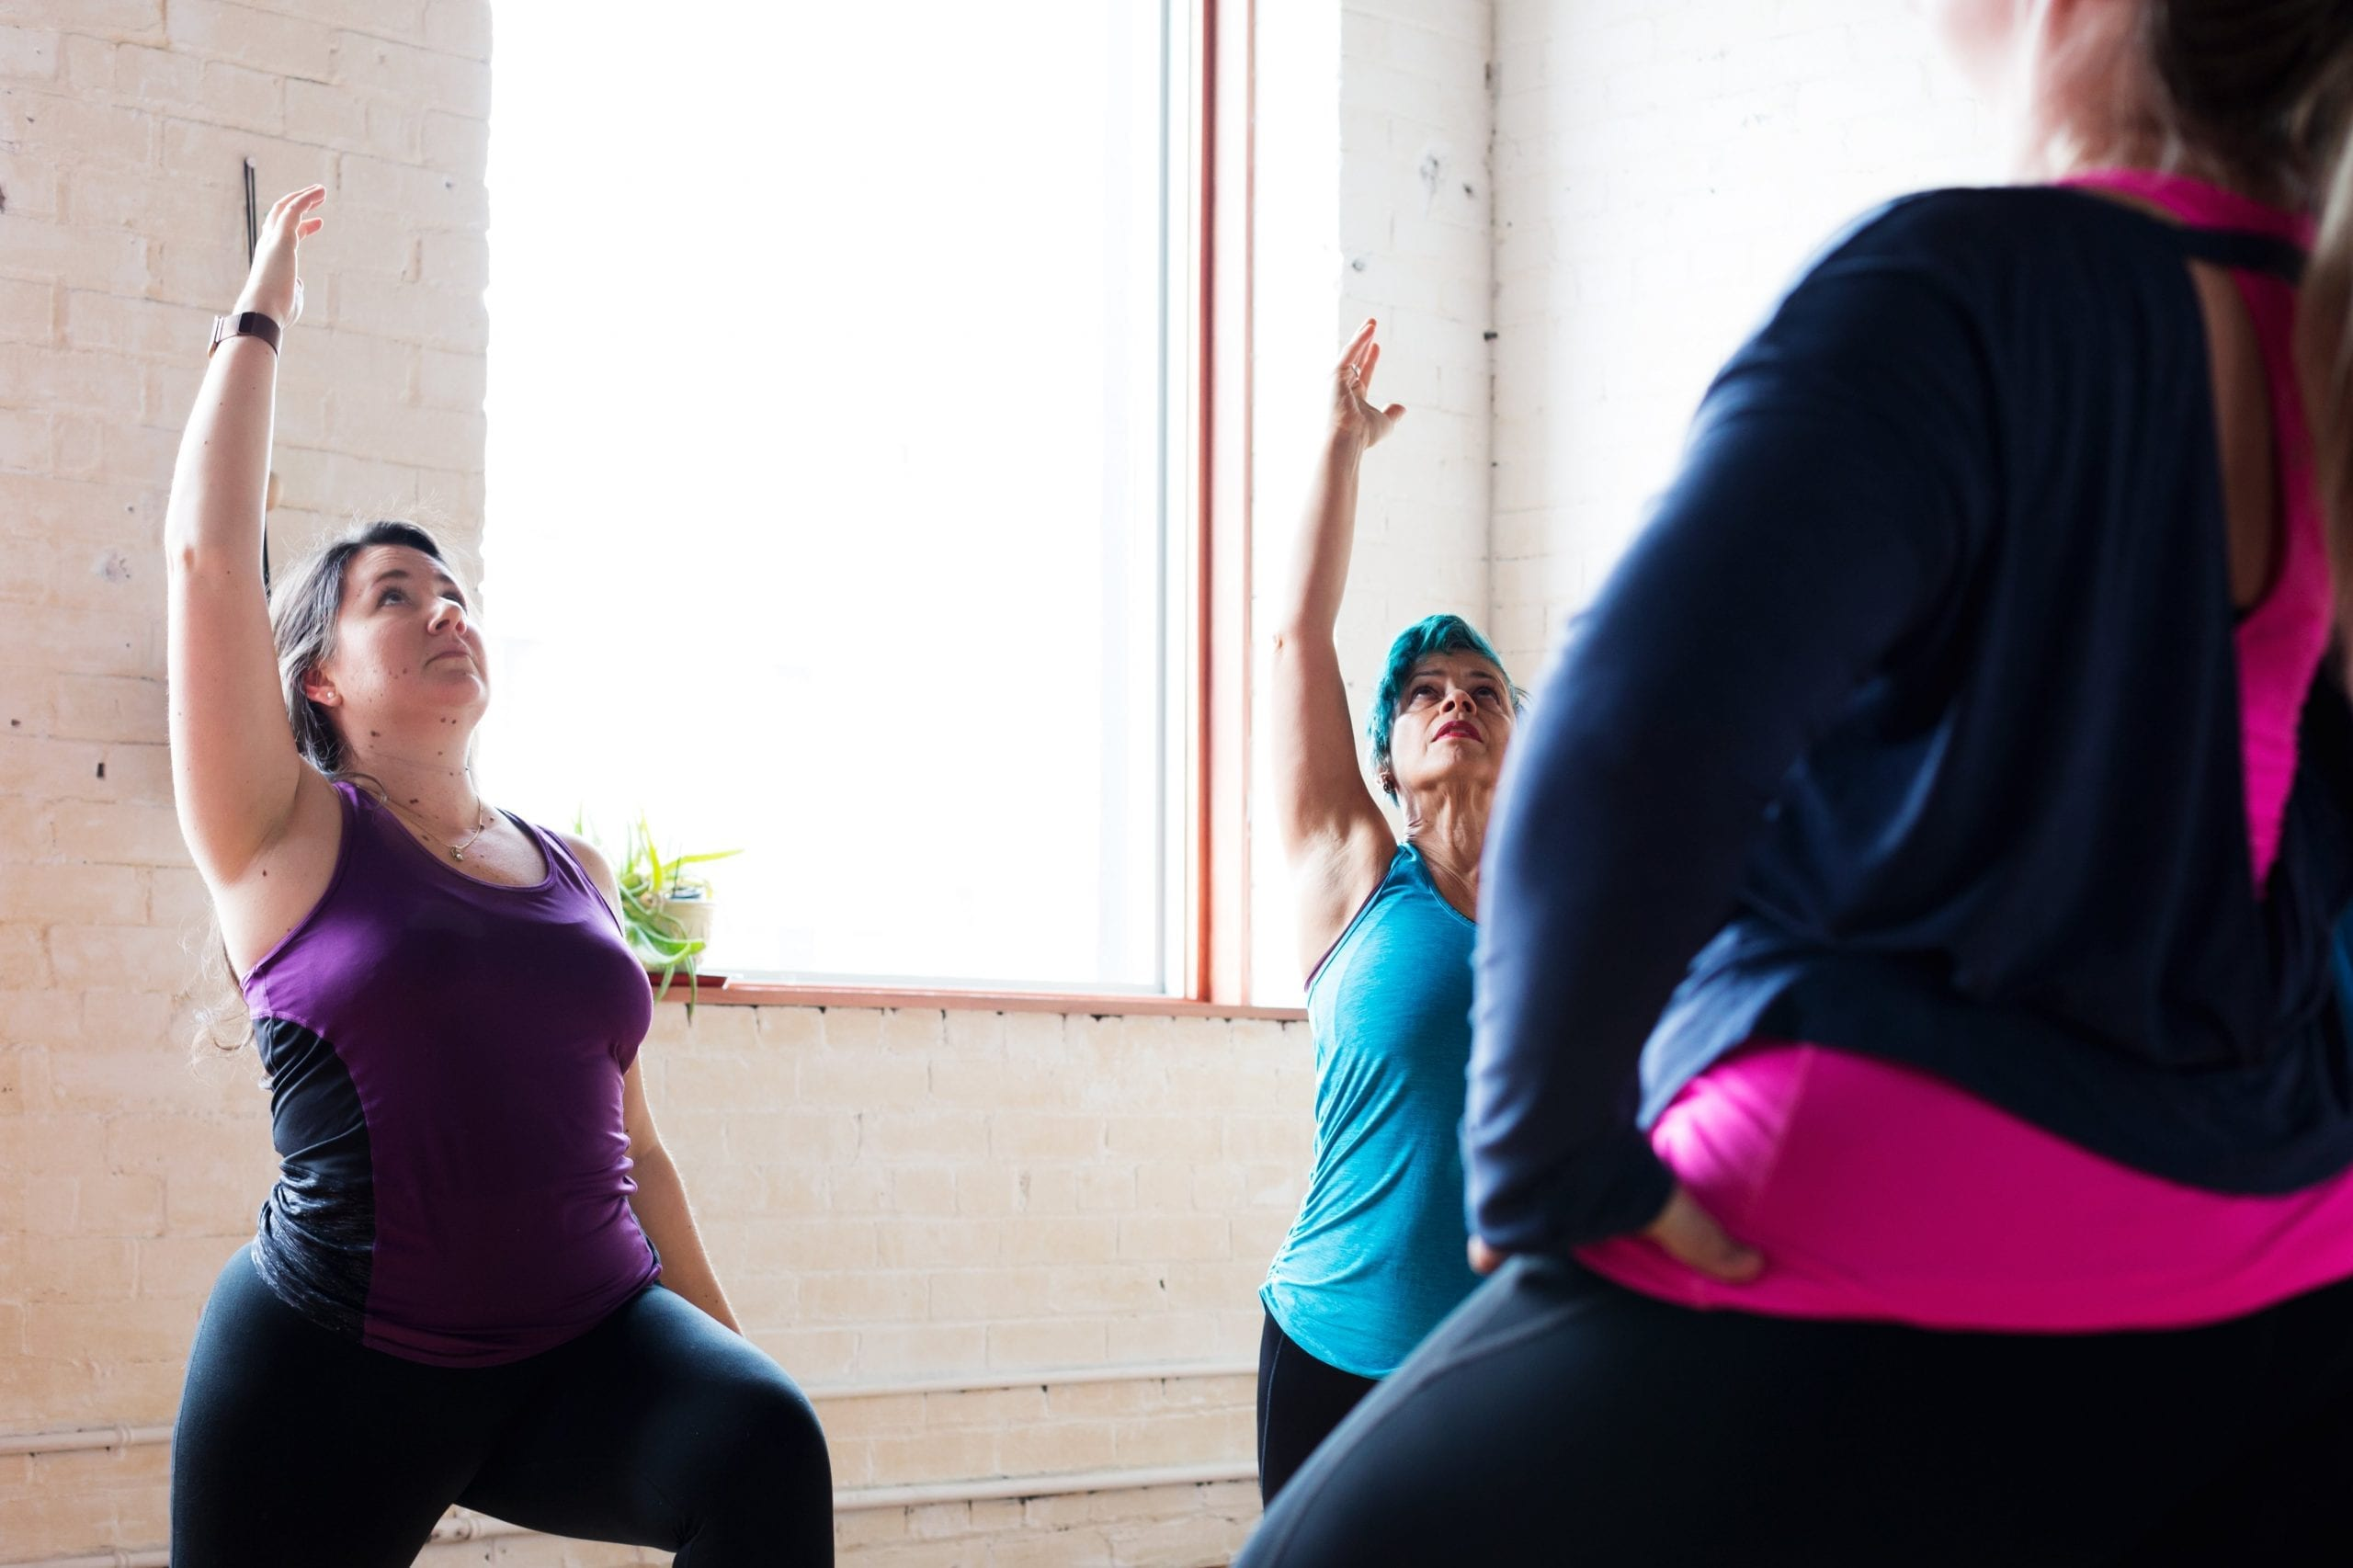 women doing yoga next to a window